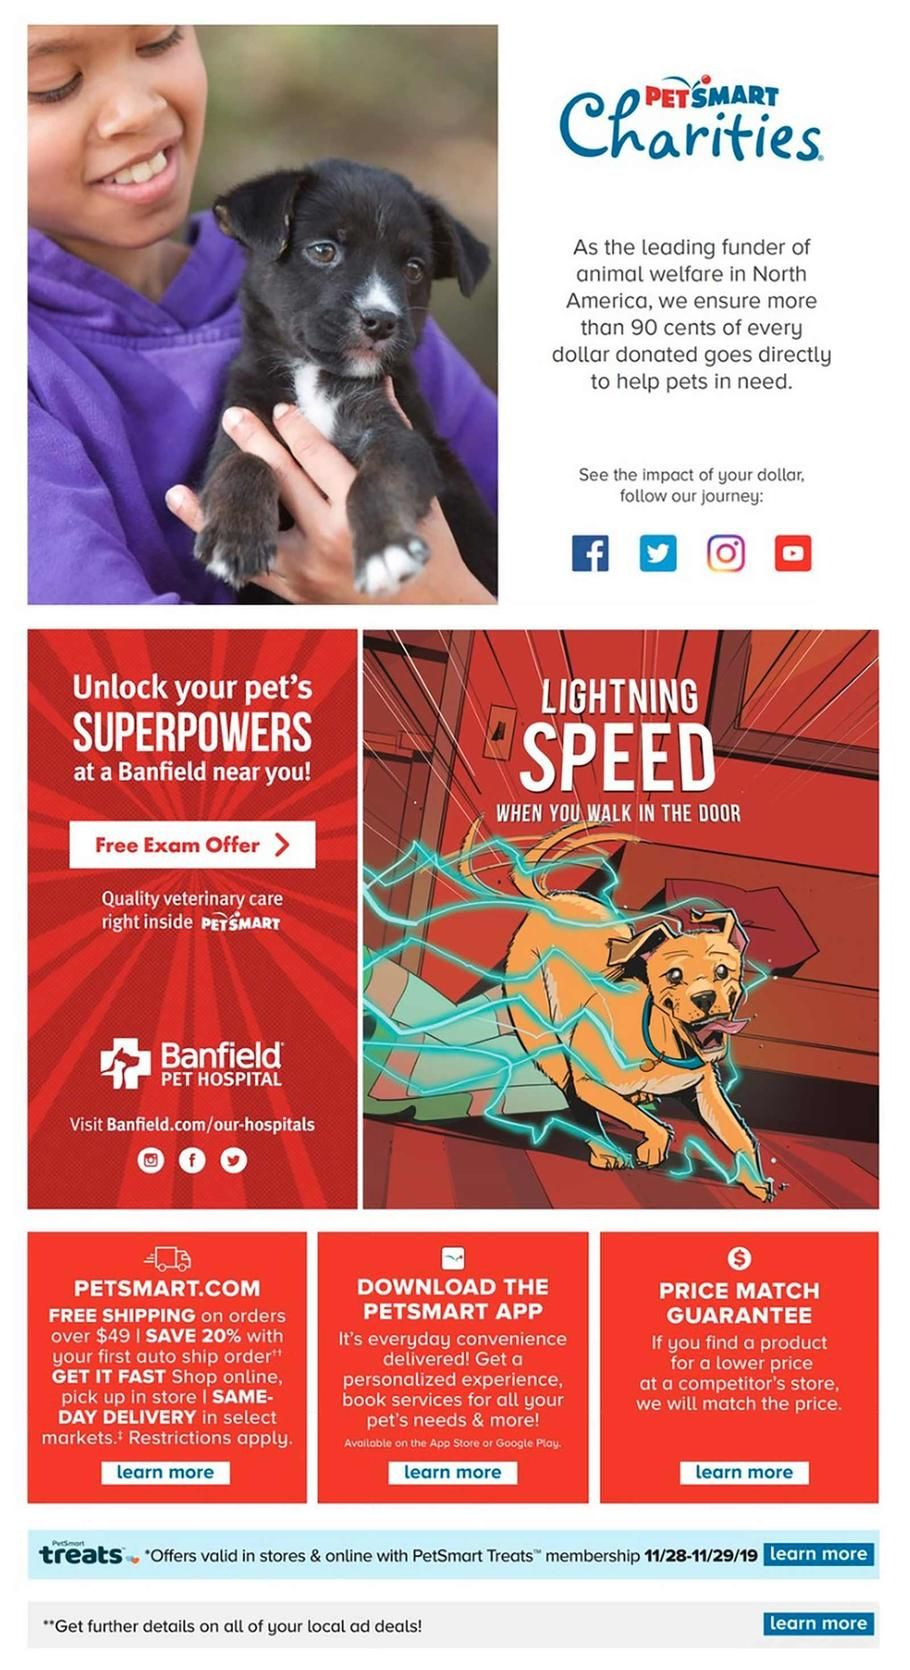 Petsmart Black Friday Ad Scan Deals And Sales 2019 Page 10 Of 10 Black Friday Ads Black Friday Black Friday News